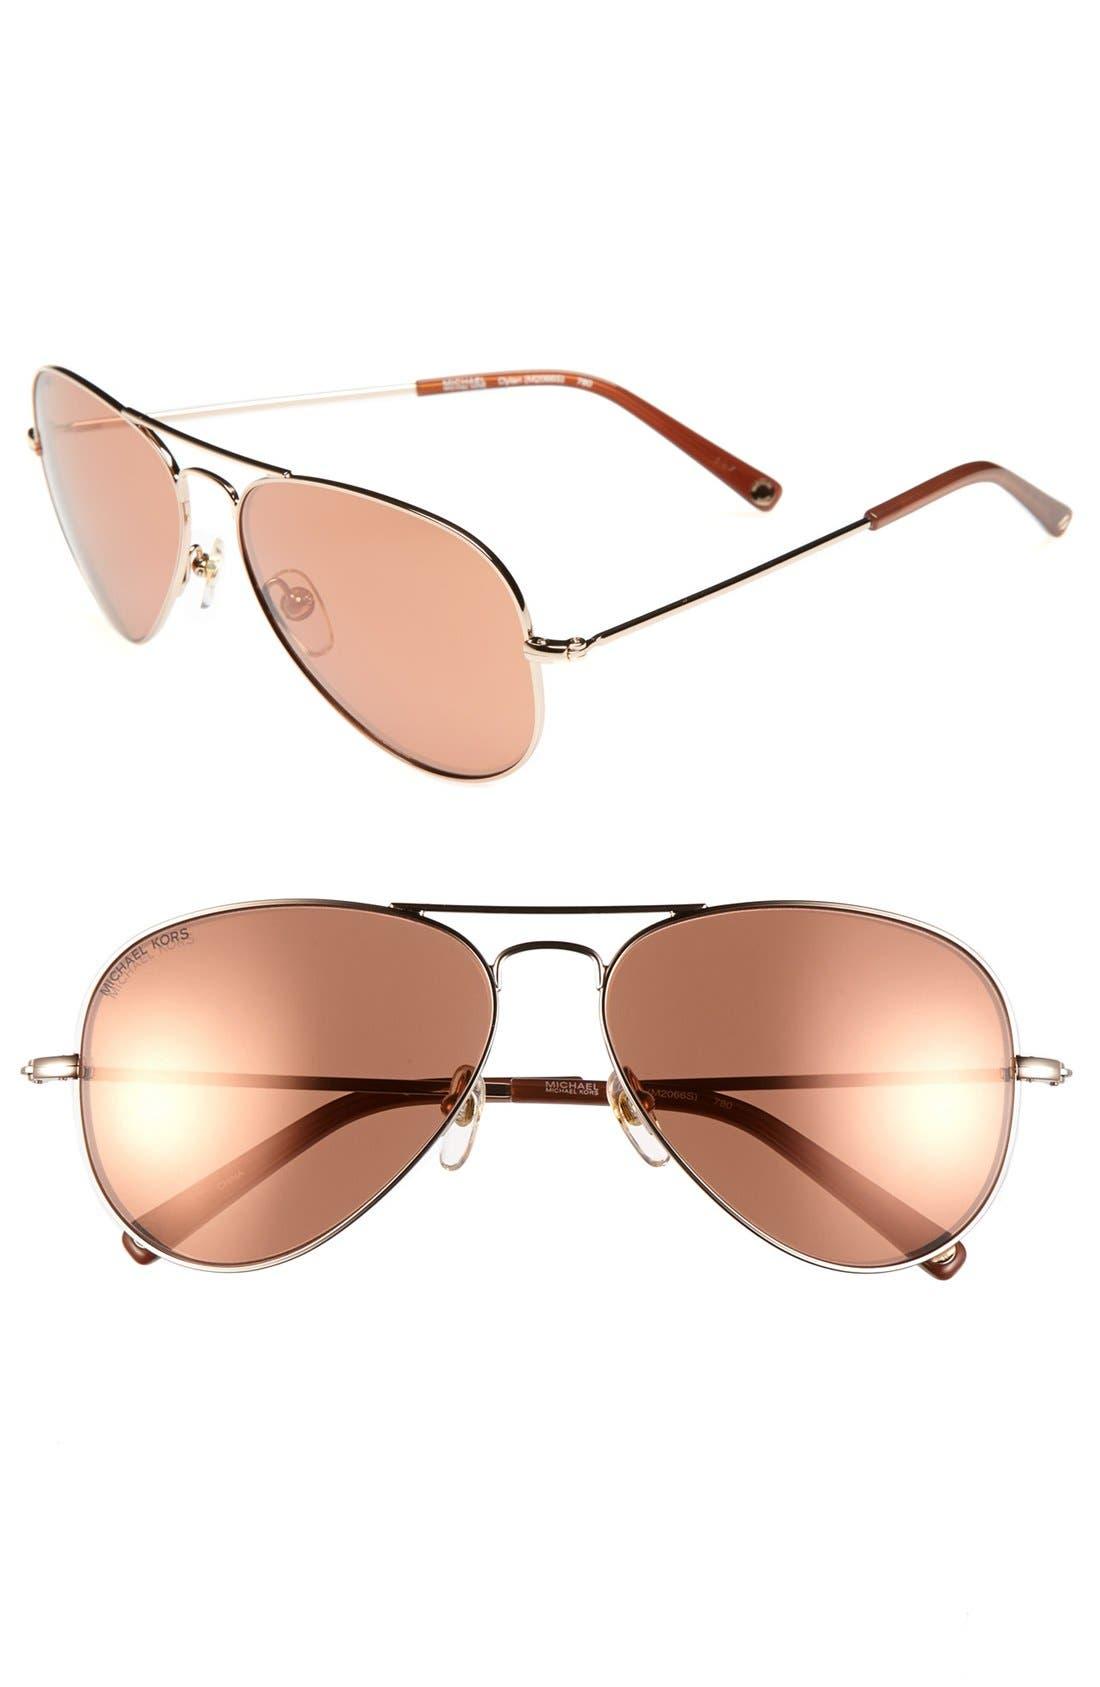 Alternate Image 1 Selected - MICHAEL Michael Kors 'Dylan' 58mm Aviator Sunglasses